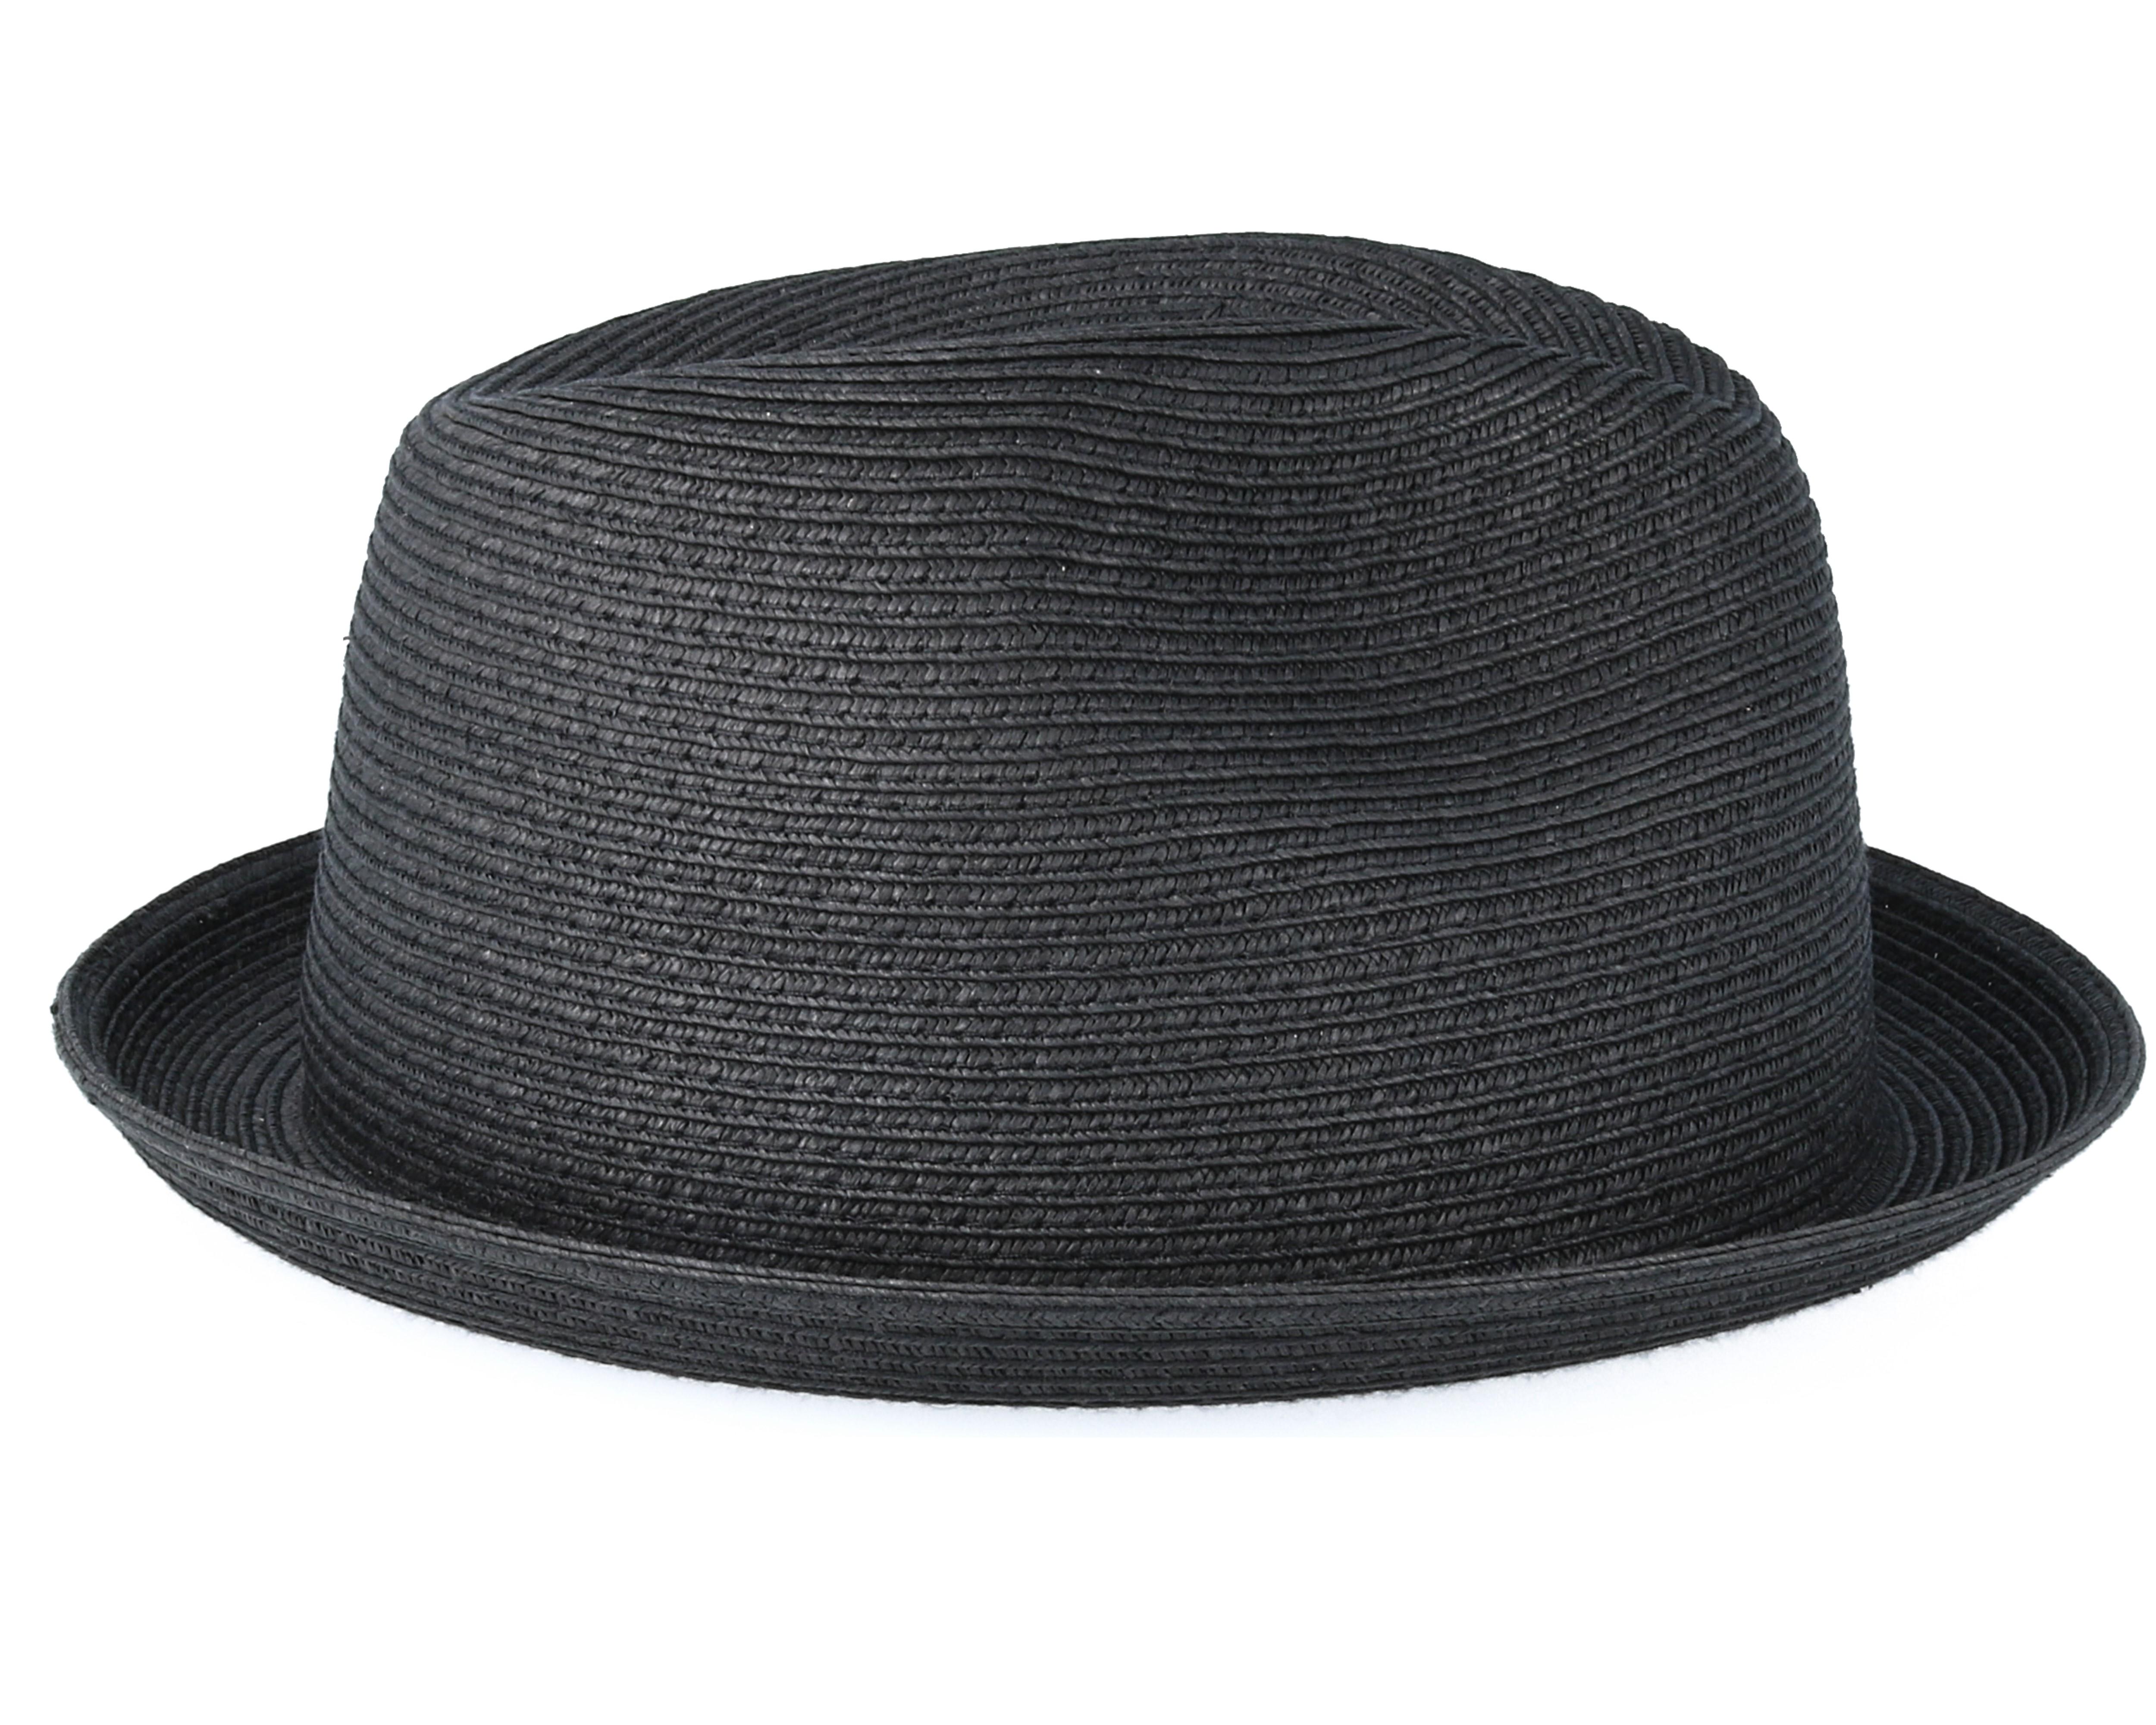 Player Toyo Black Straw Stetson Hats Hatstore Co Uk